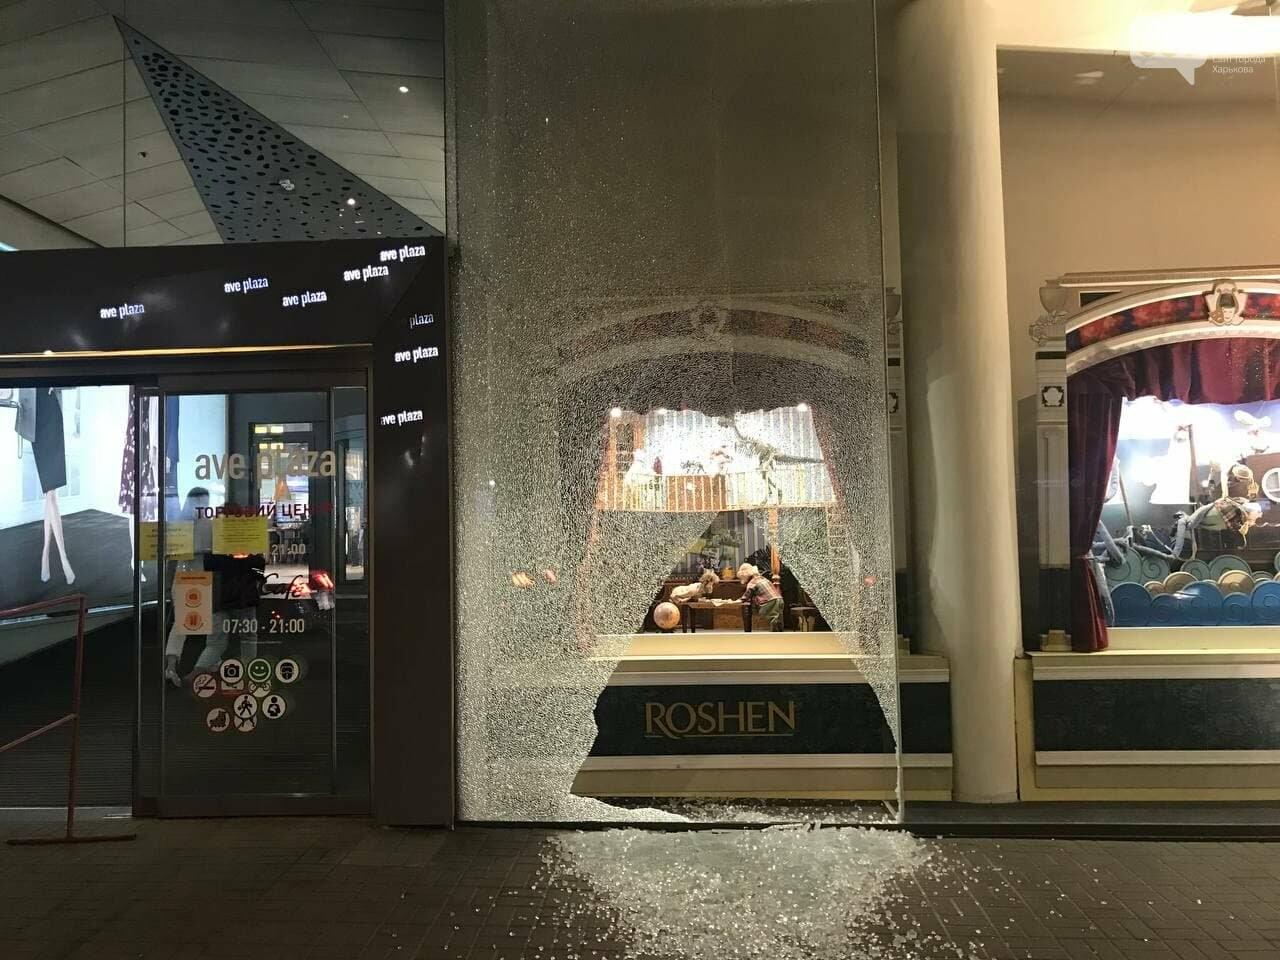 В центре Харькова неизвестные разгромили витрину ТЦ, - ФОТО, фото-2